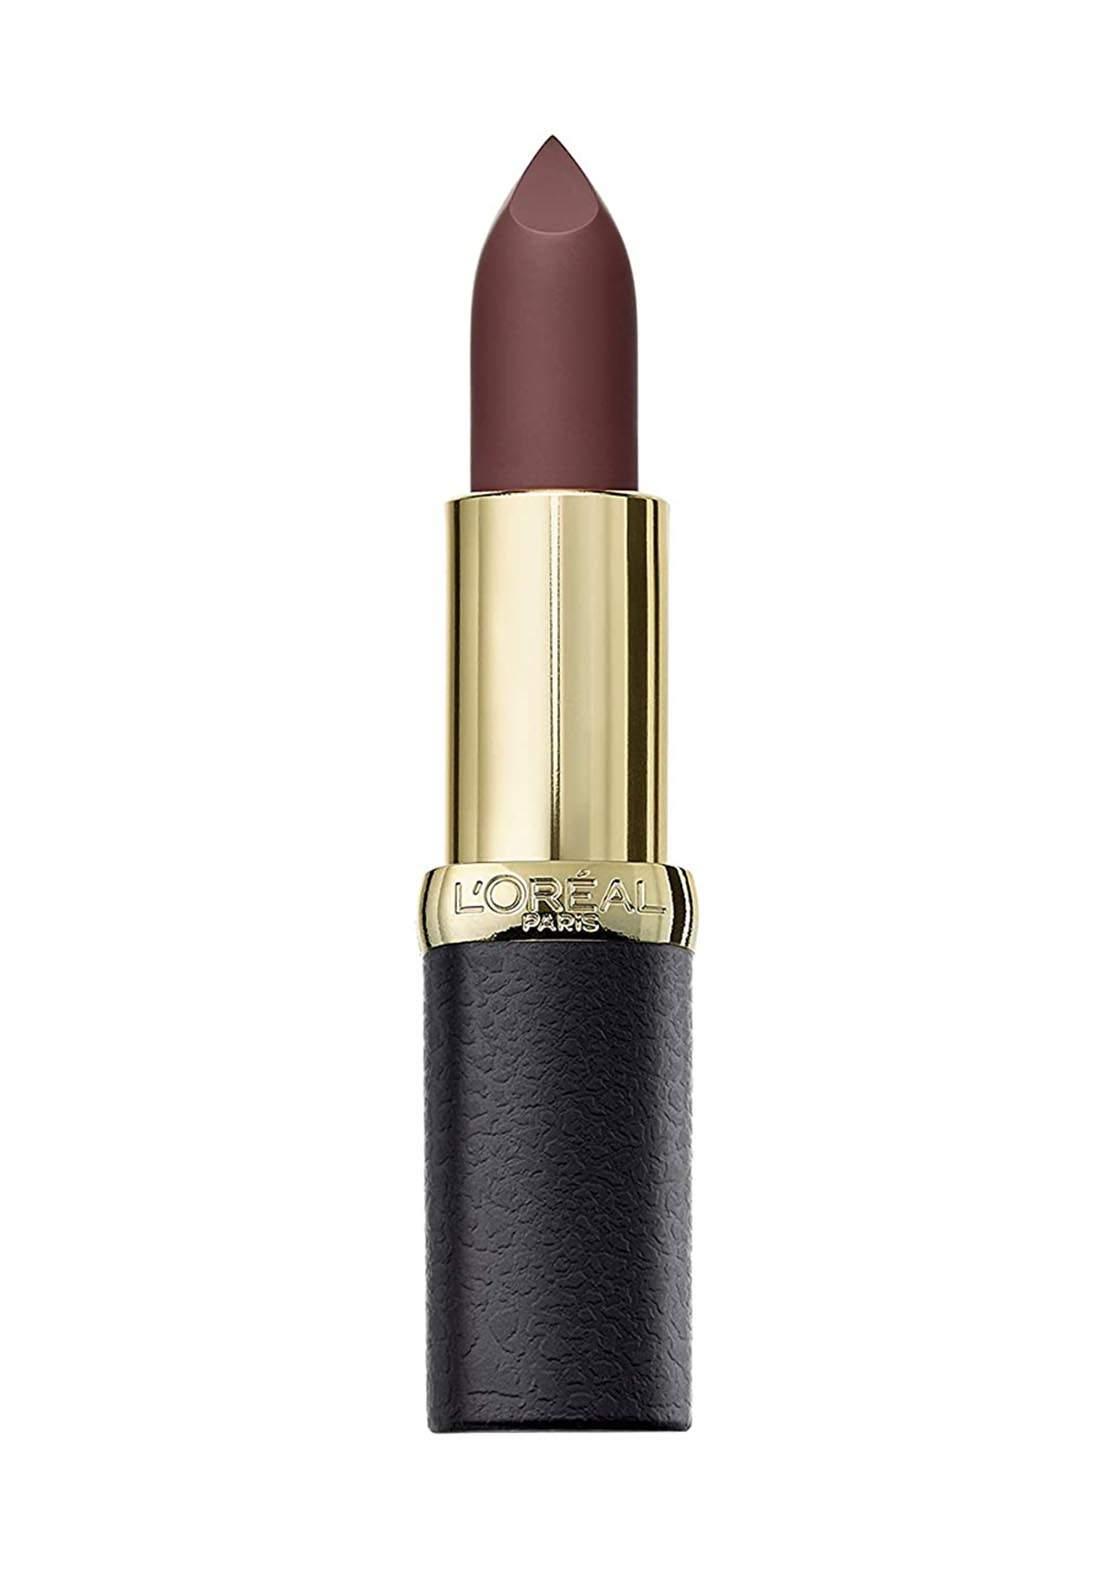 L'Oreal Color Riche Matte Addiction Lipstick 654 Bronze Sautoir (027-1021) احمر شفاه